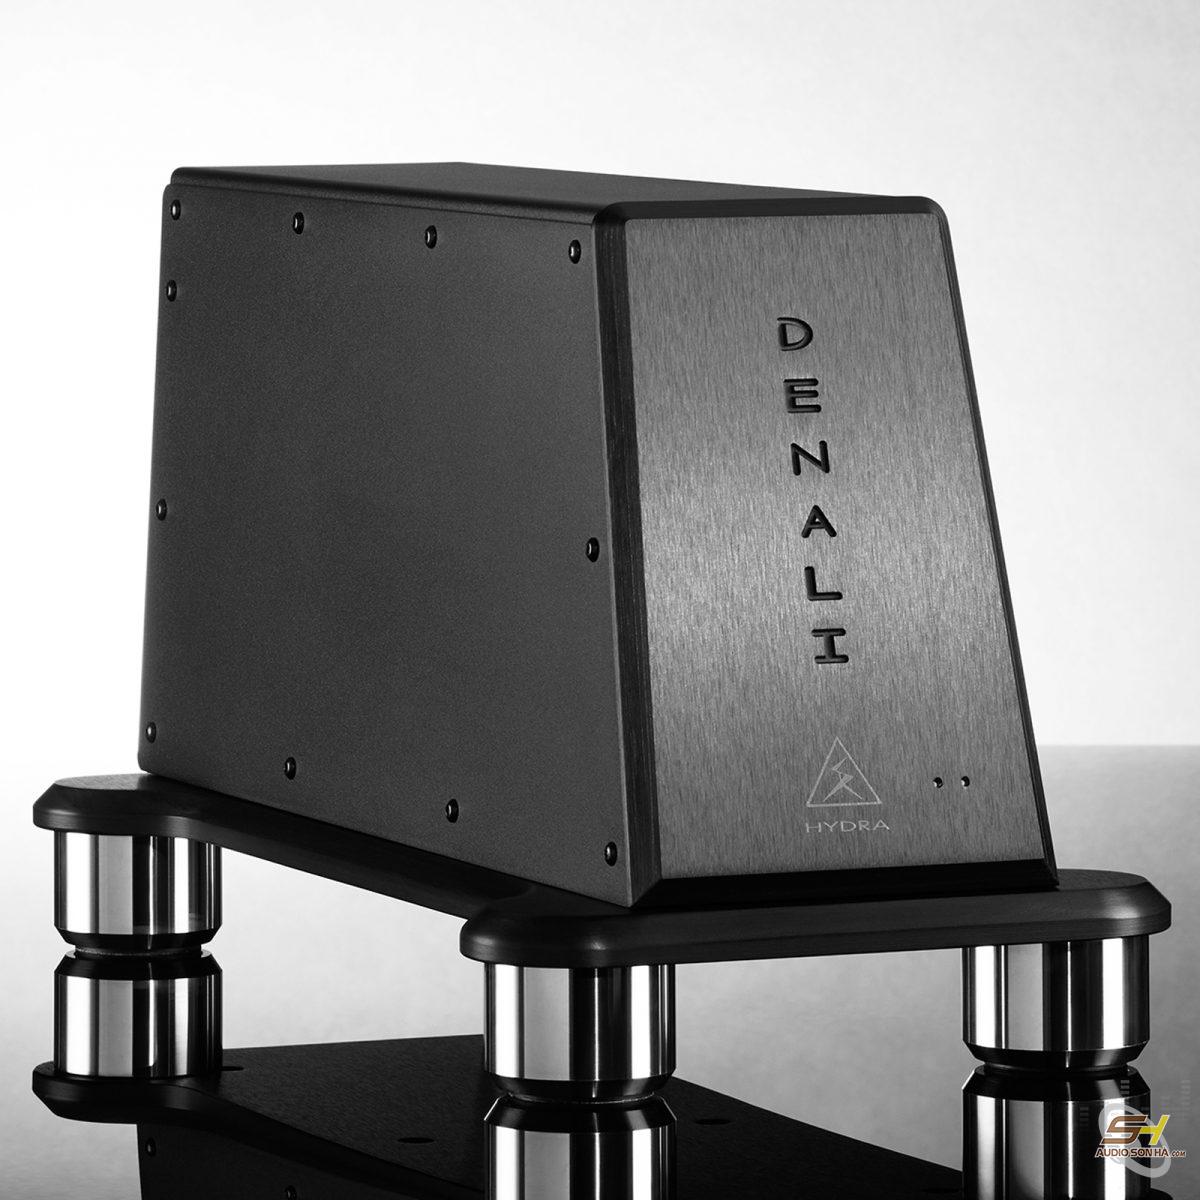 Shunyata DENALI D2000/T 240V 2 Outlet